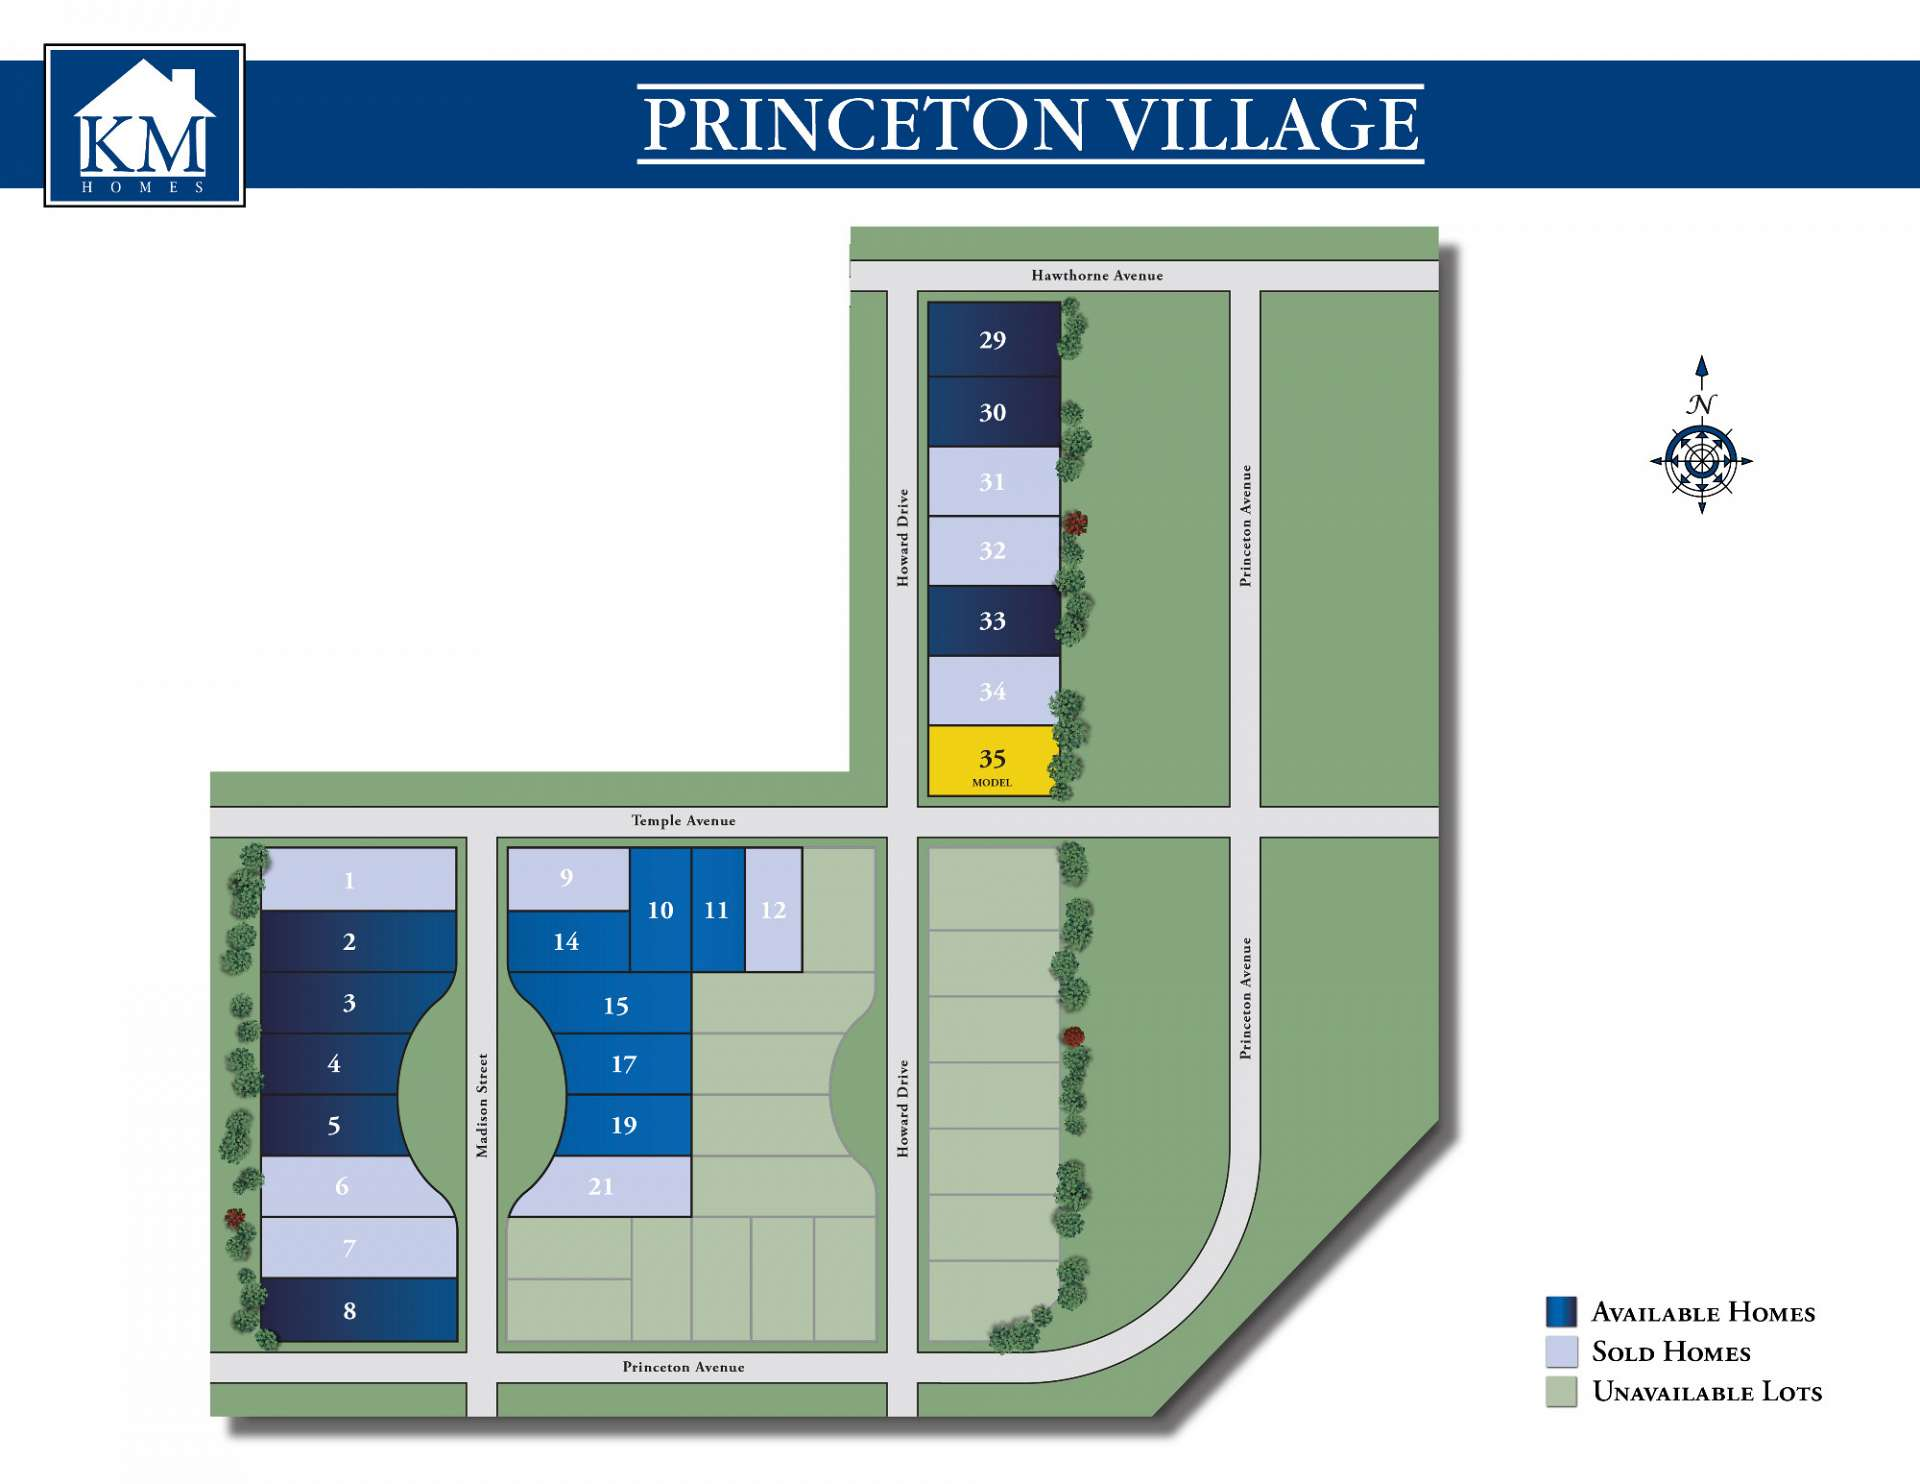 PrincetonVillage